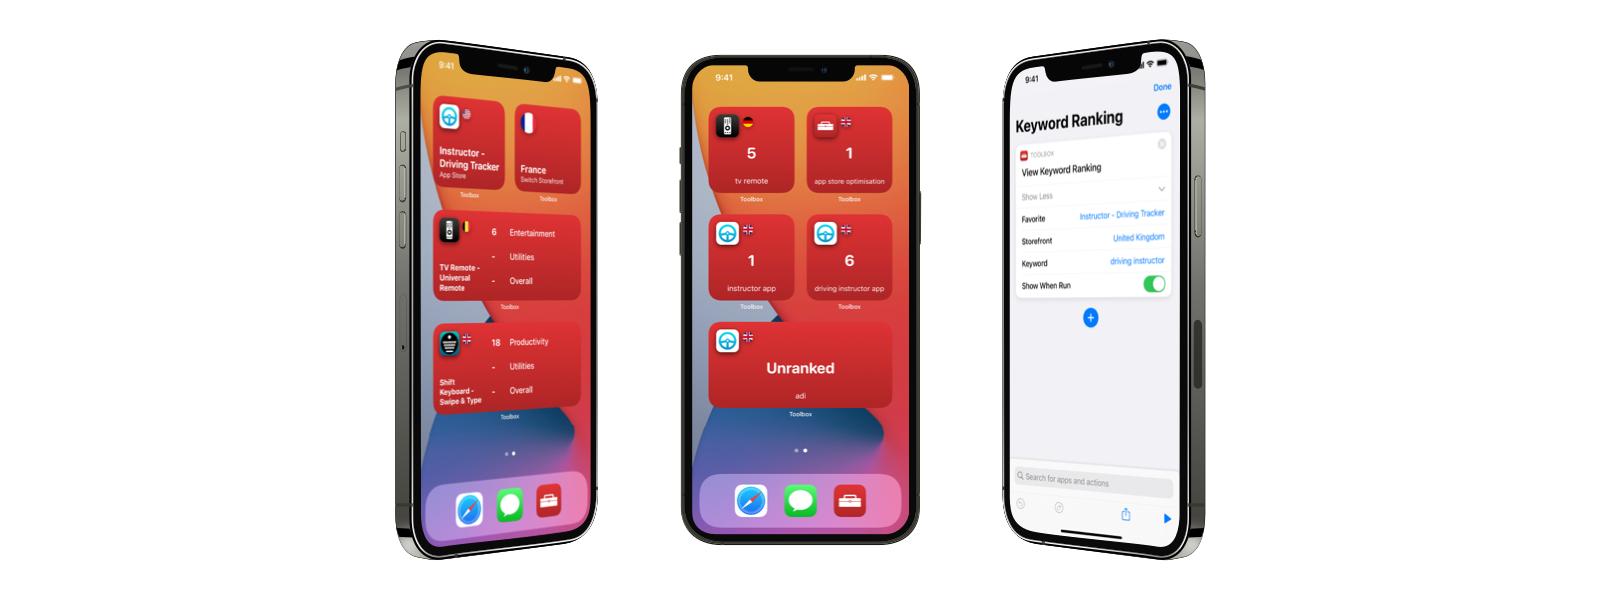 Widget Image on iPhone